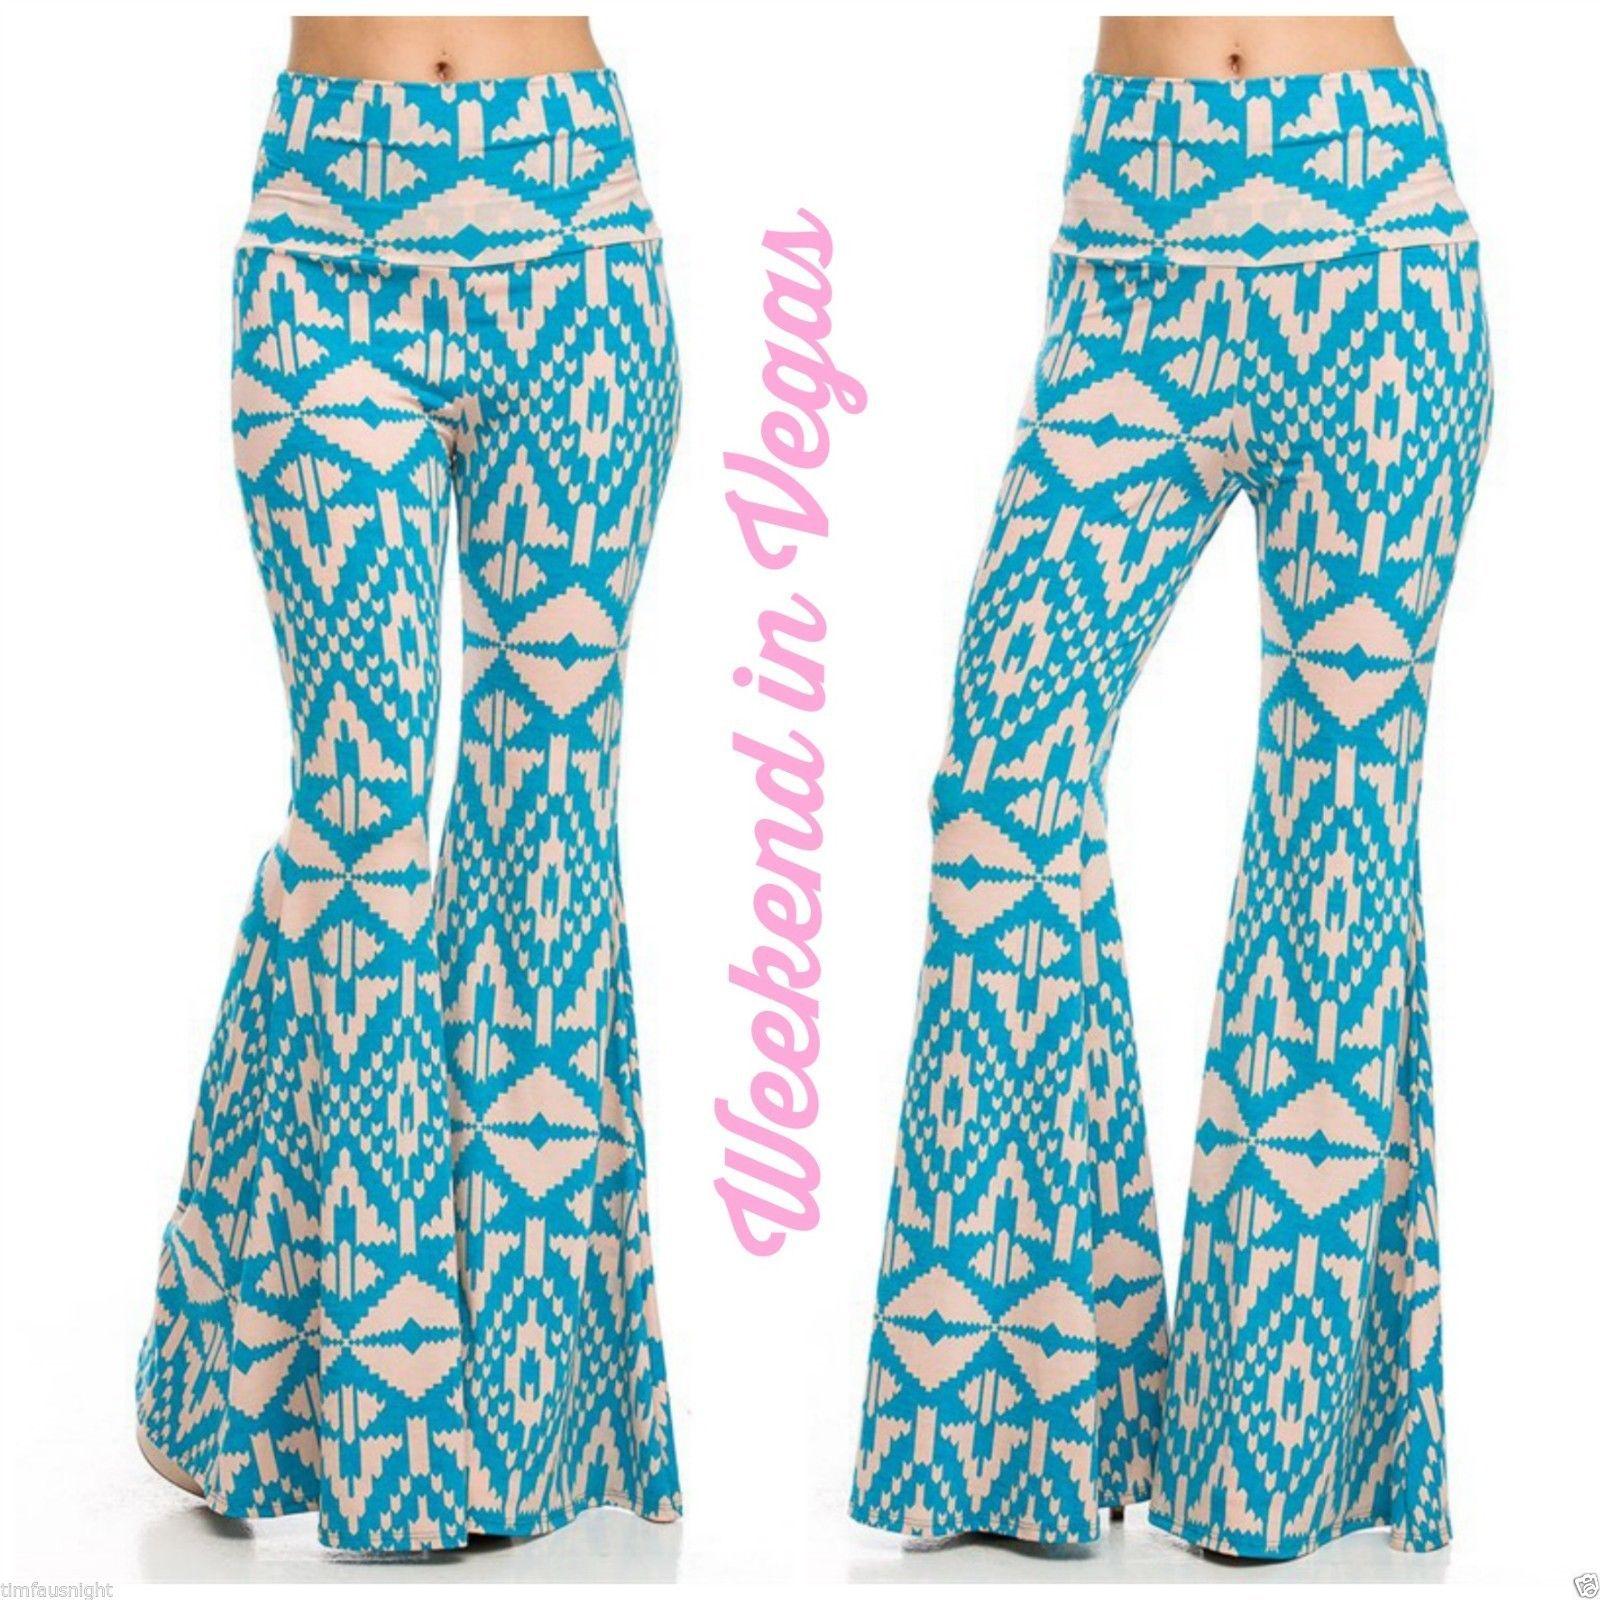 eaa2710d0dafb Tribal Boho Turquoise Blush Pink Tapered Leg Bell Bottom 70's Palazzo Pants    eBay